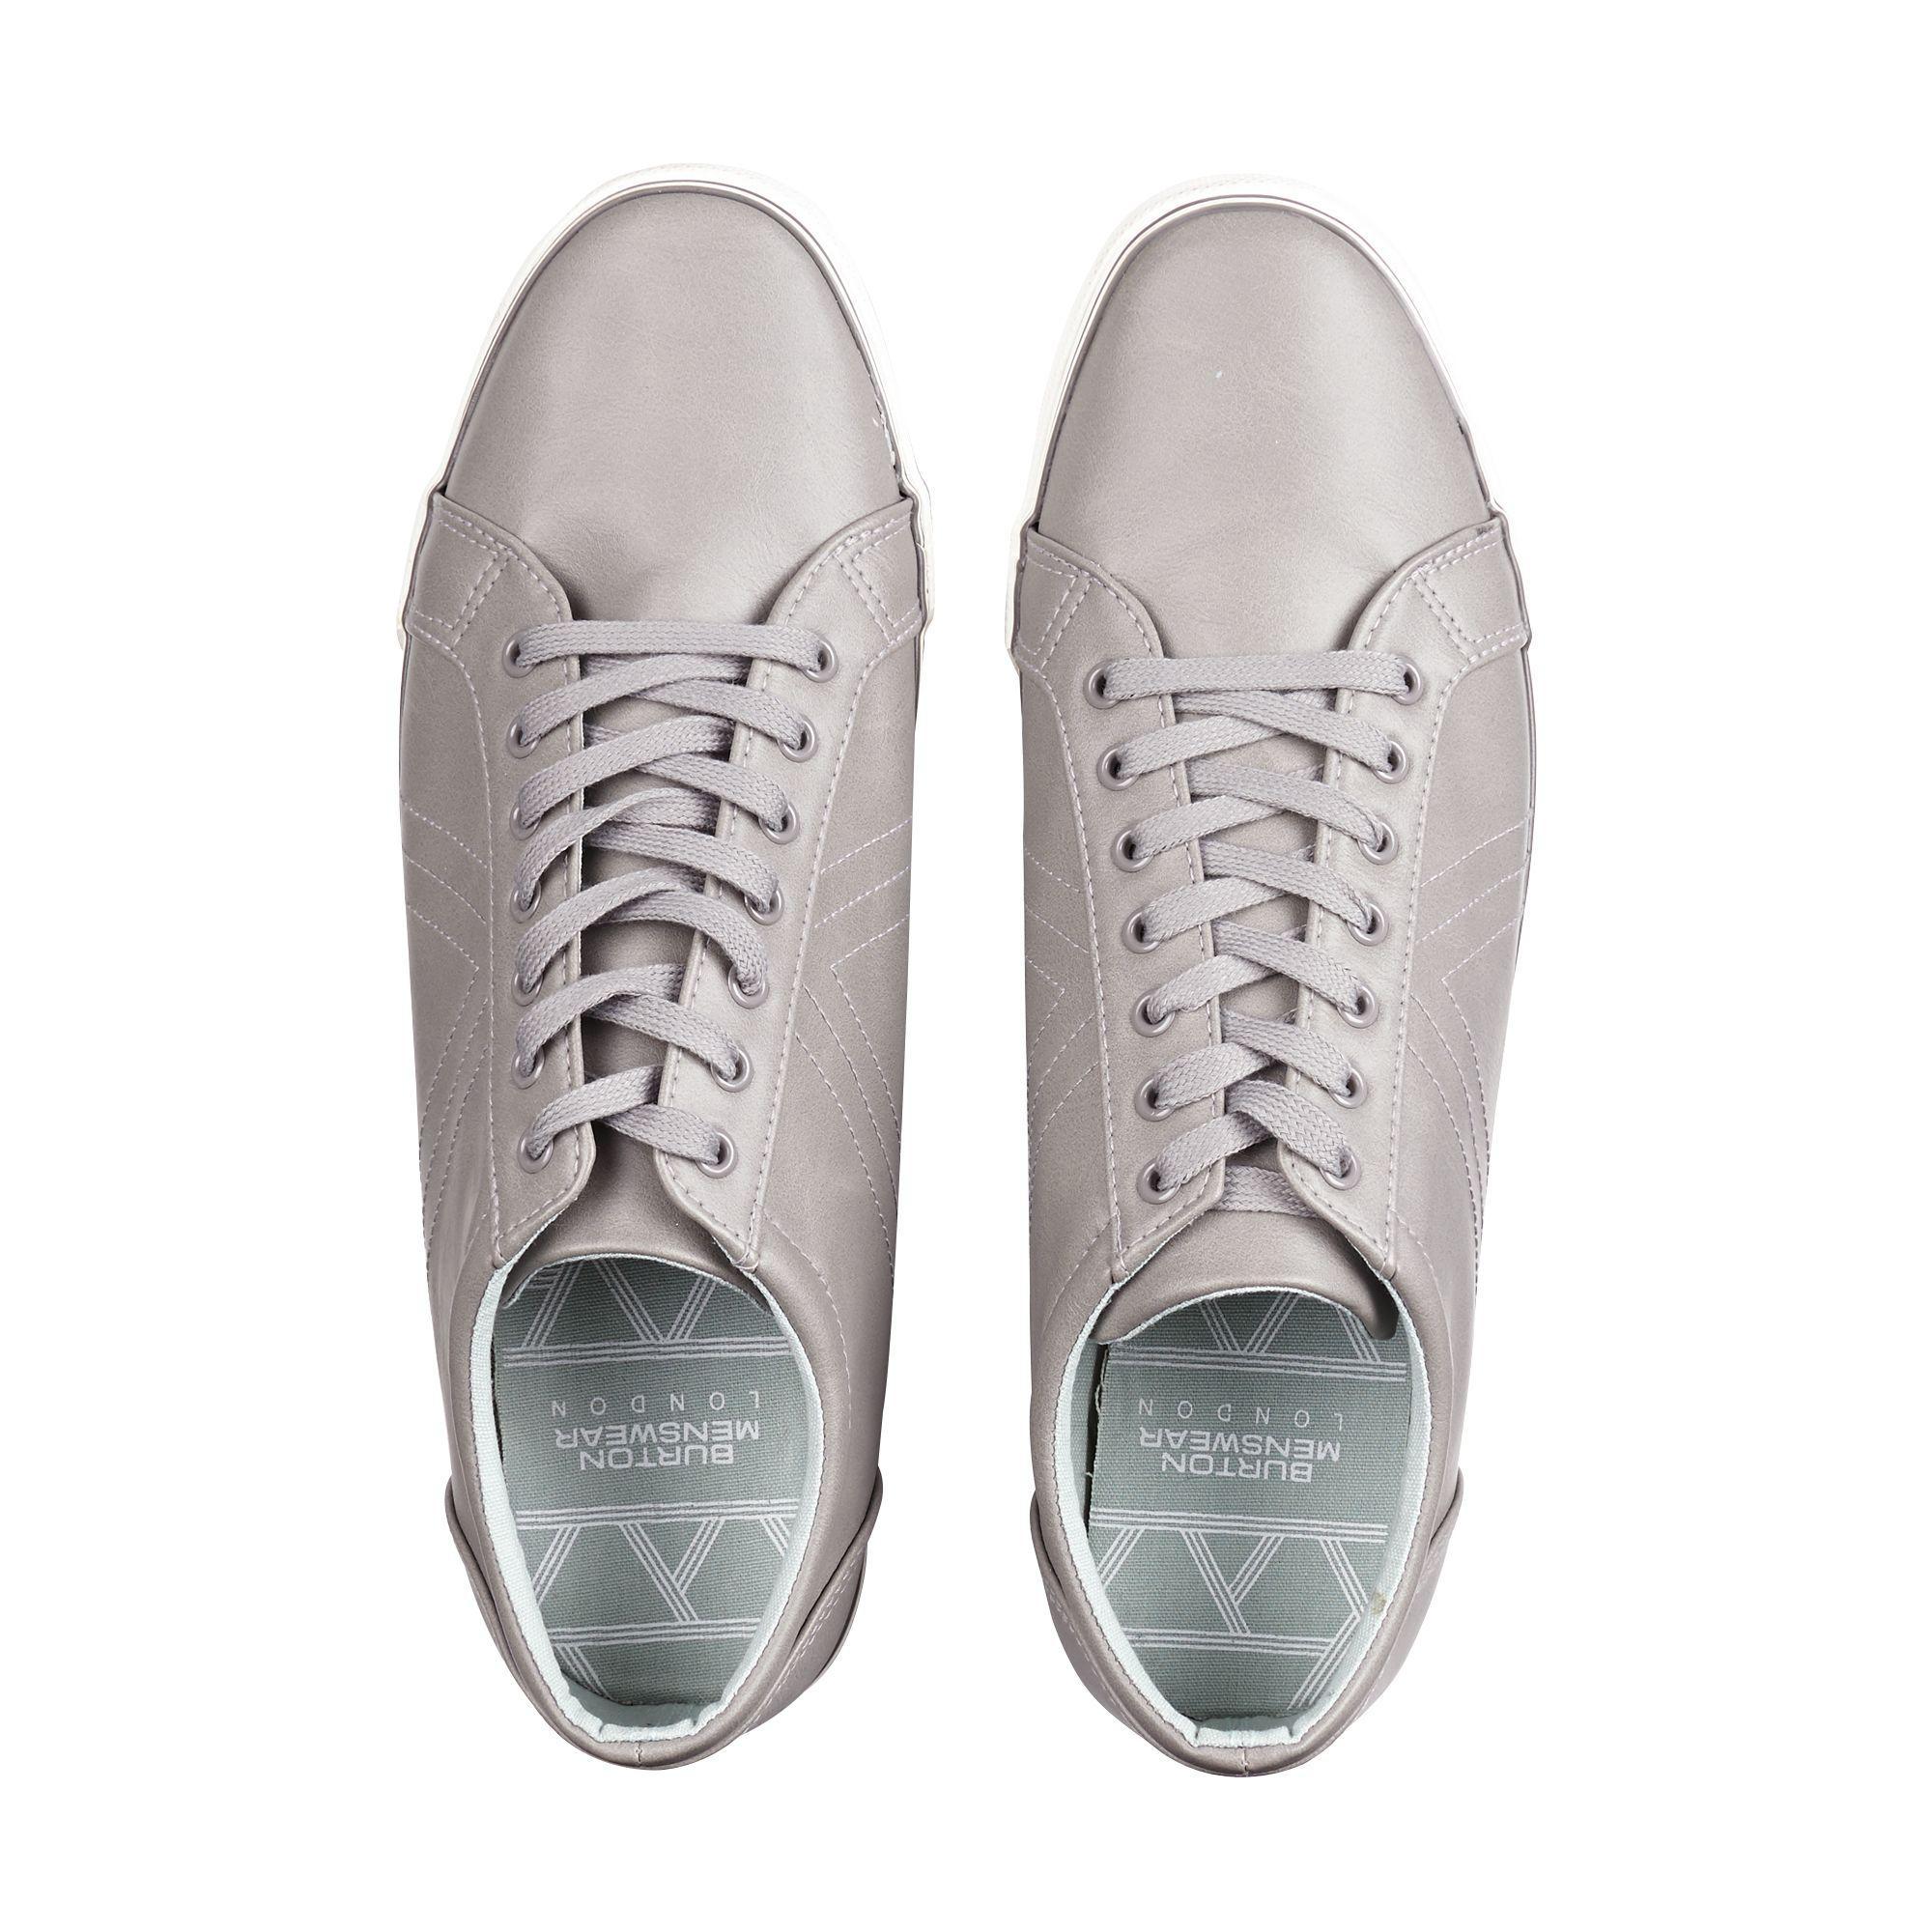 Burton Grey Canvas Trainers in Grey